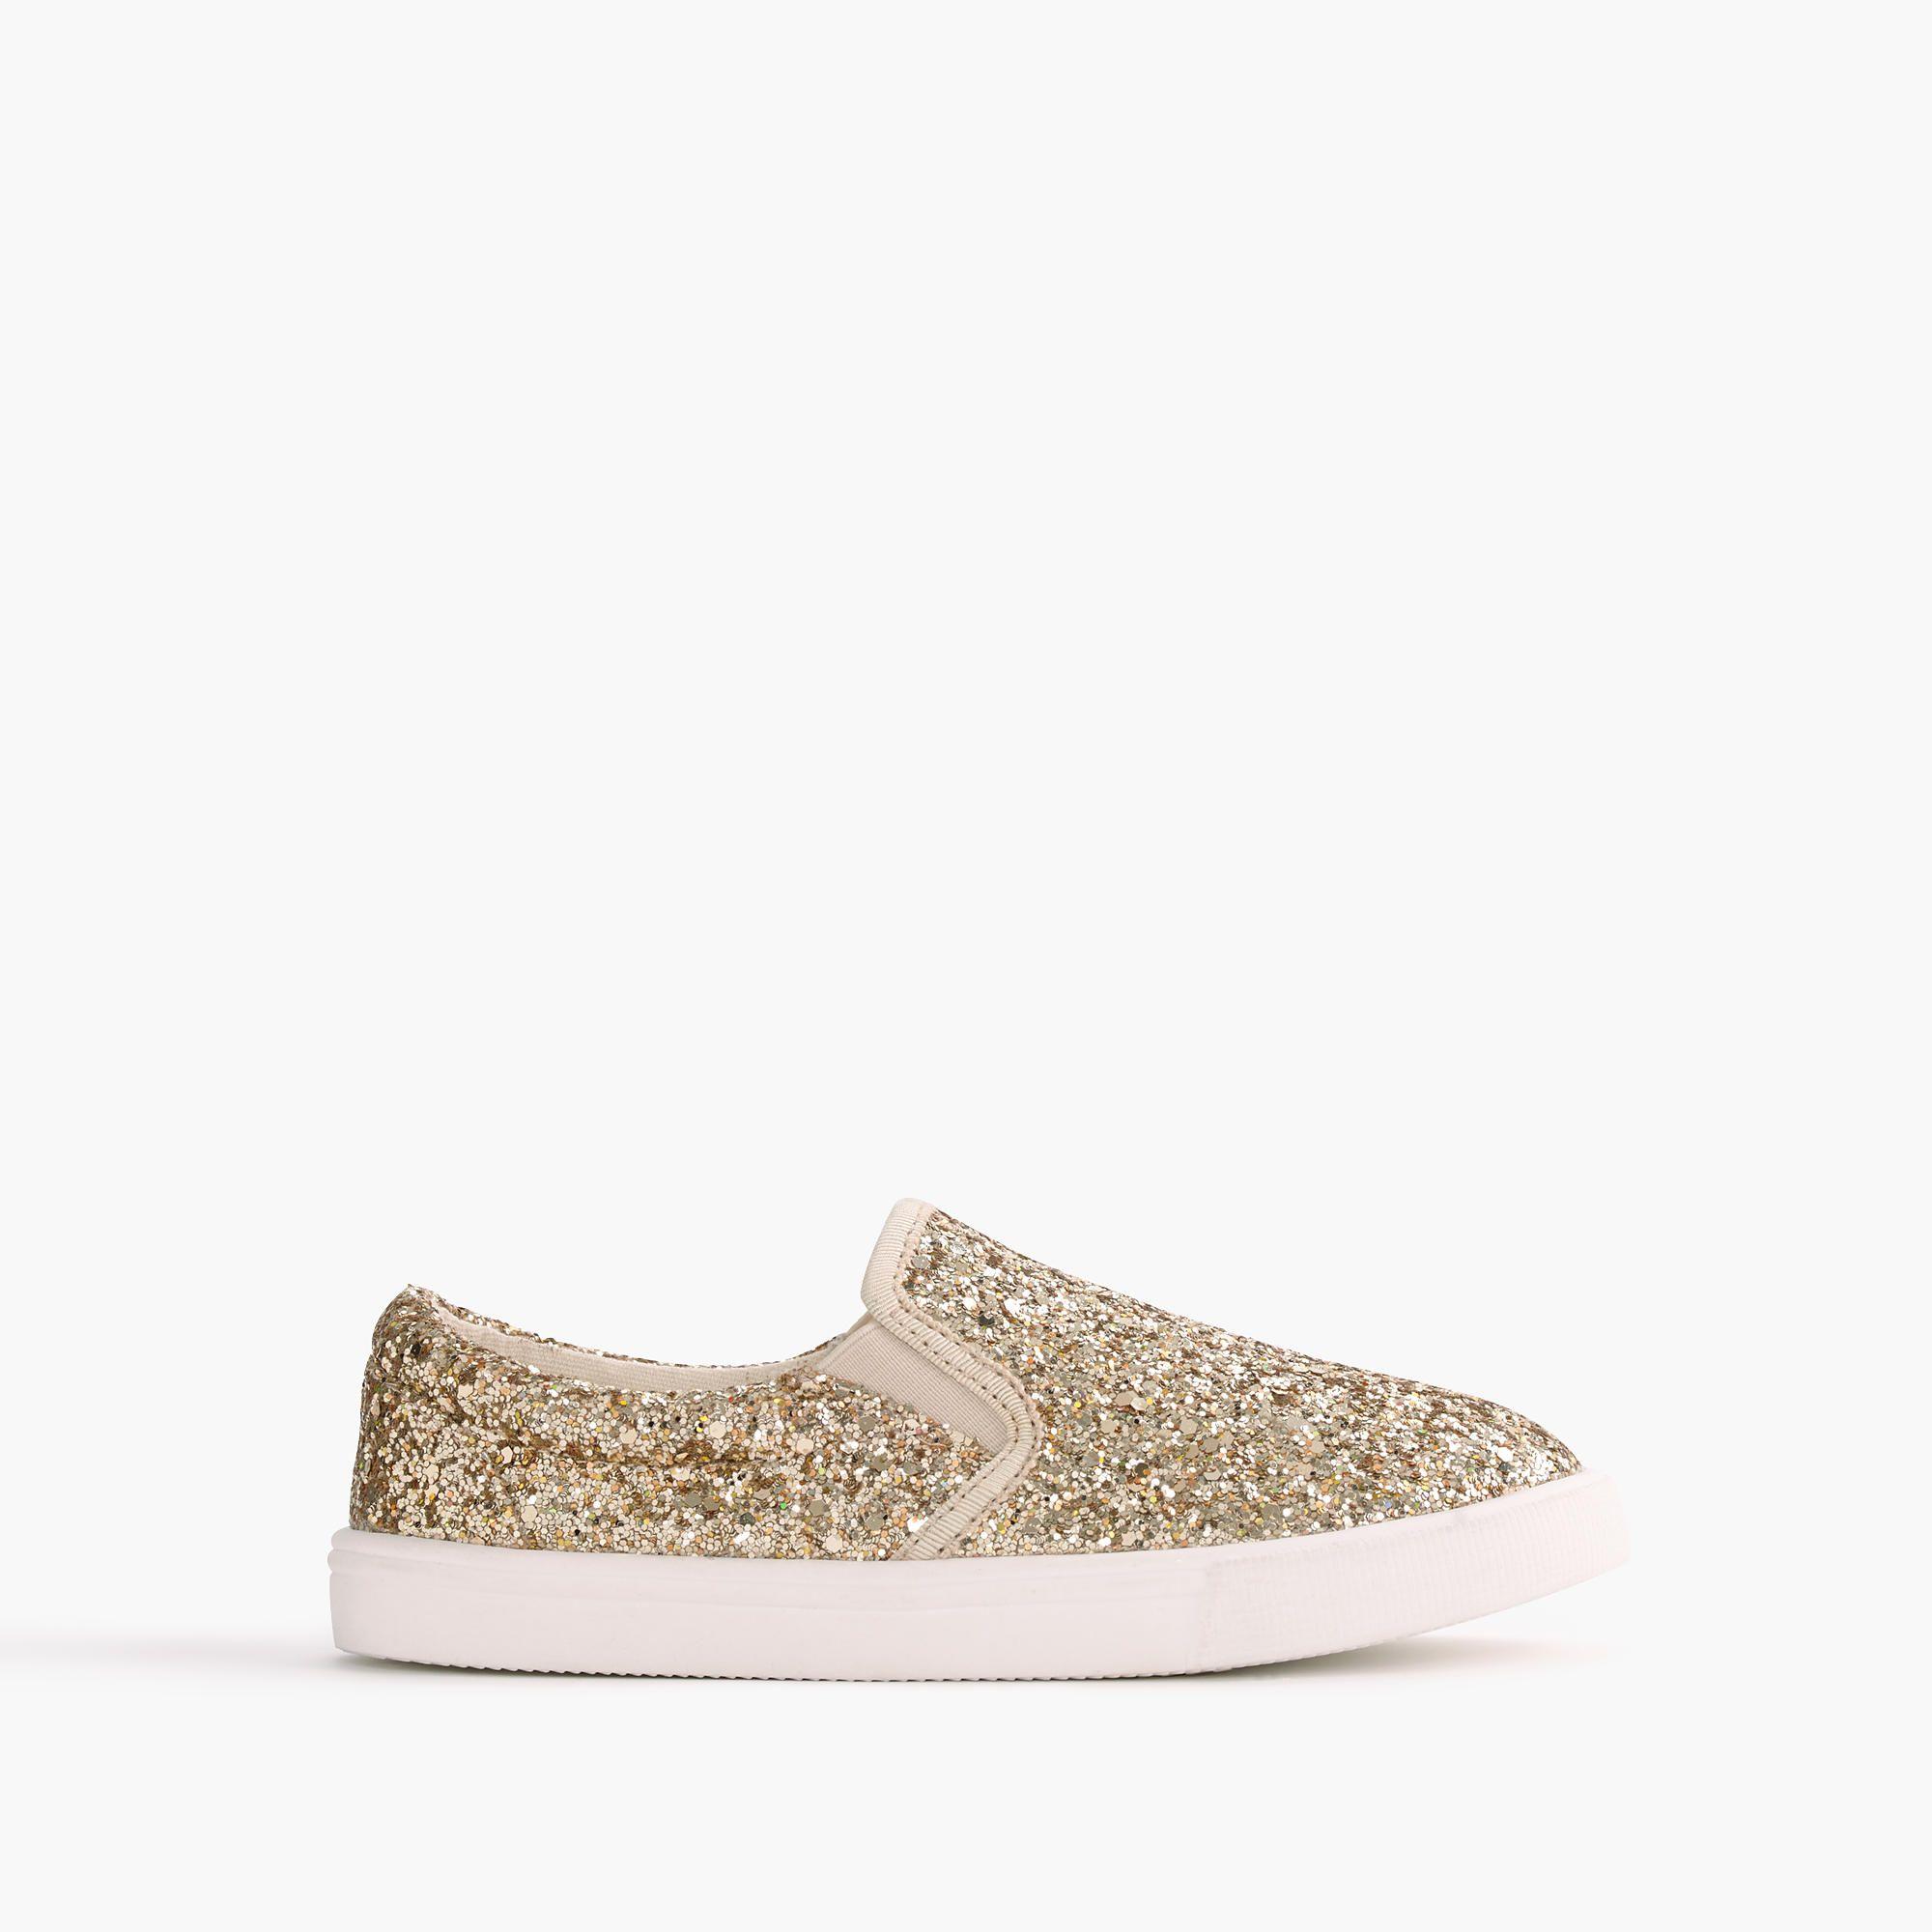 Sneakers, Girls shoes, Girls sneakers